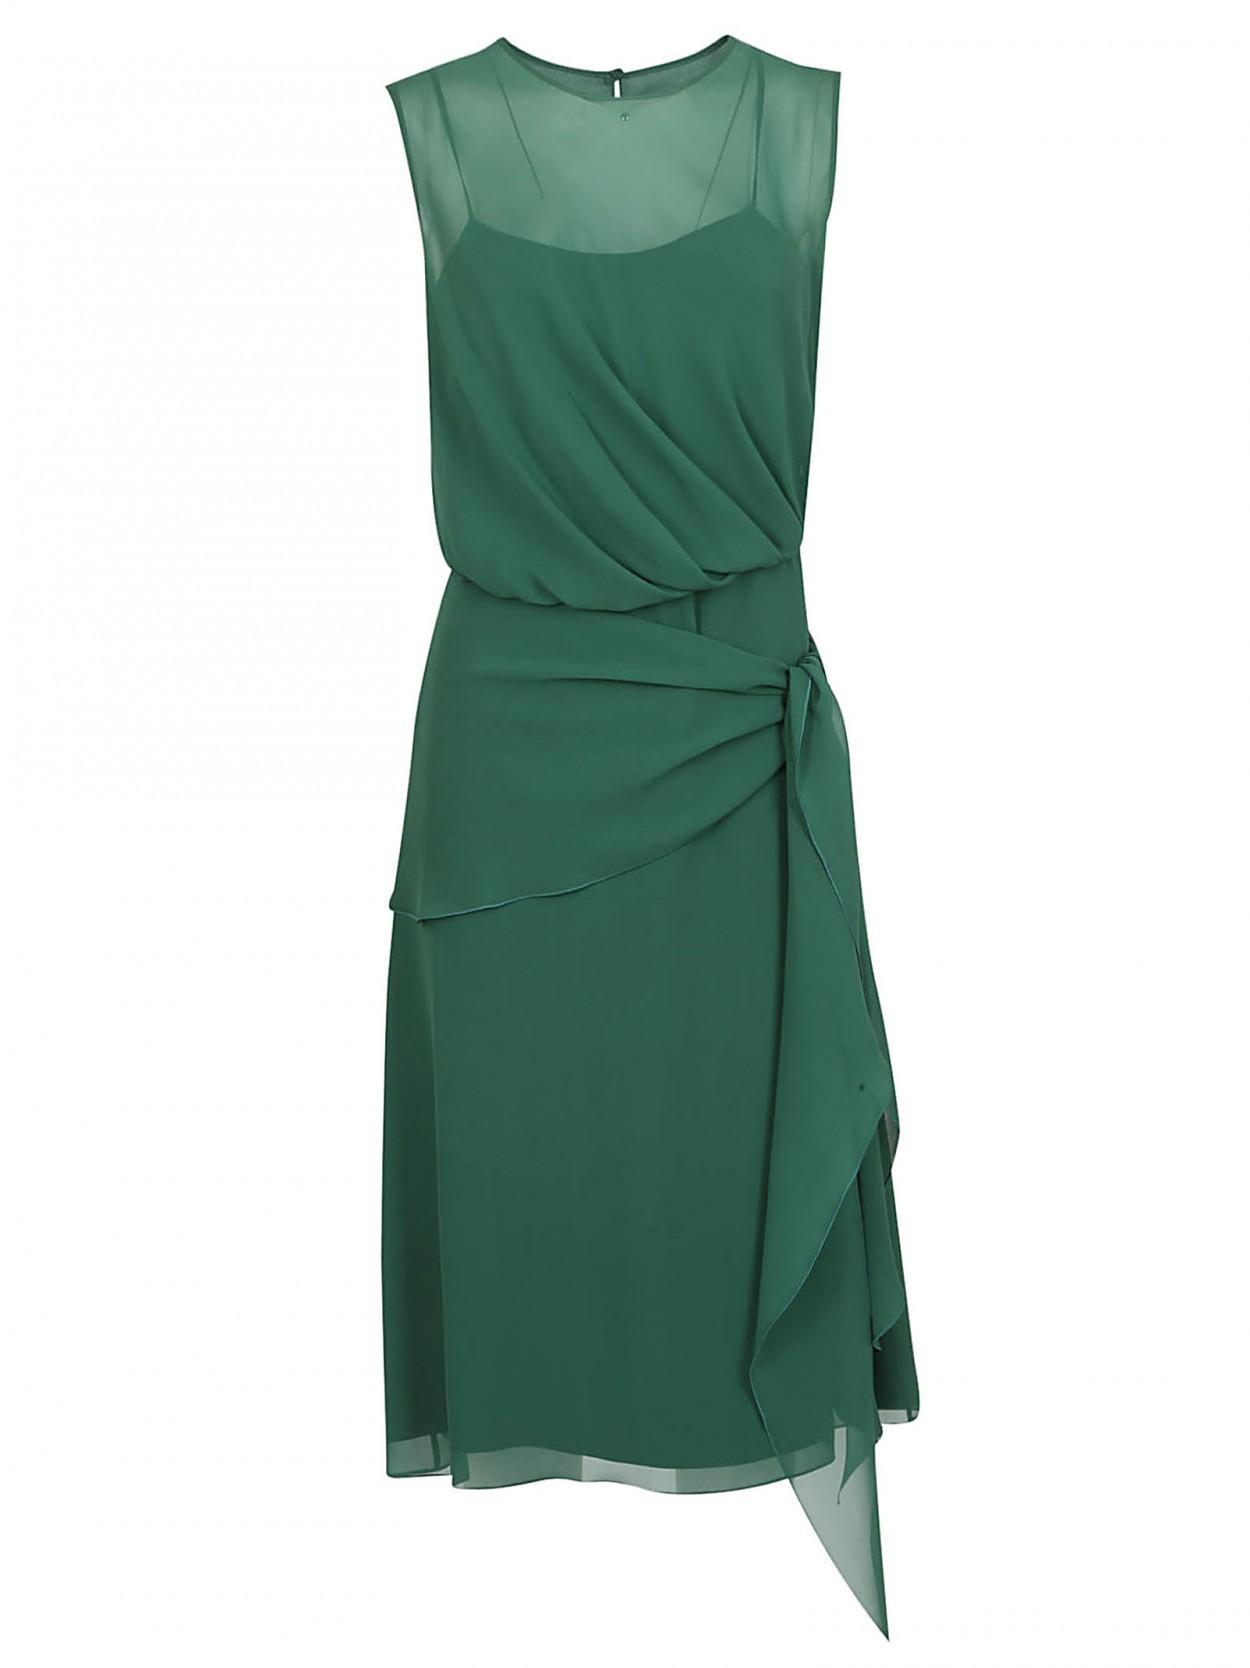 Max Mara MAX MARA abito verde in Green - Lyst 6f52a60b709